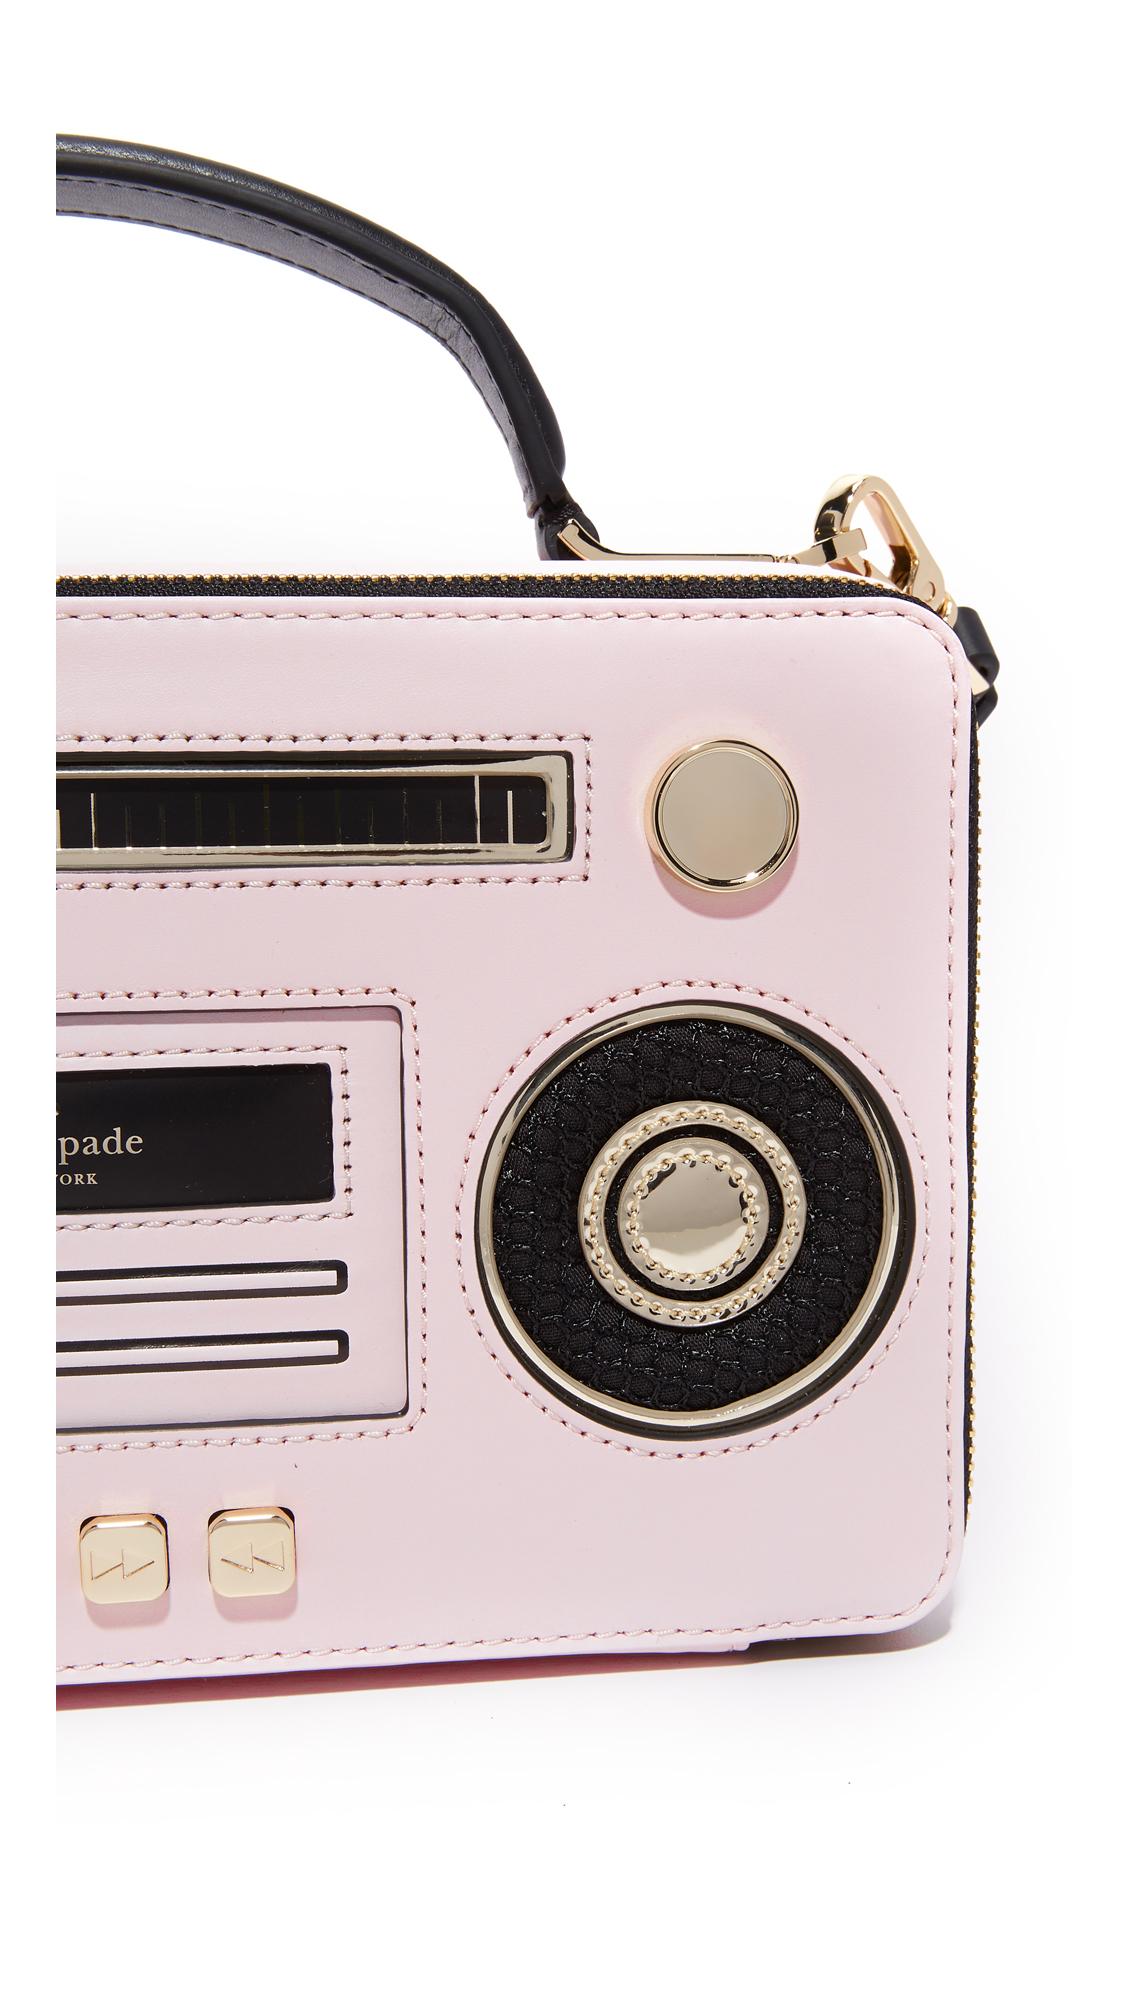 04fb0f17bac6 Kate Spade New York Boom Box Bag